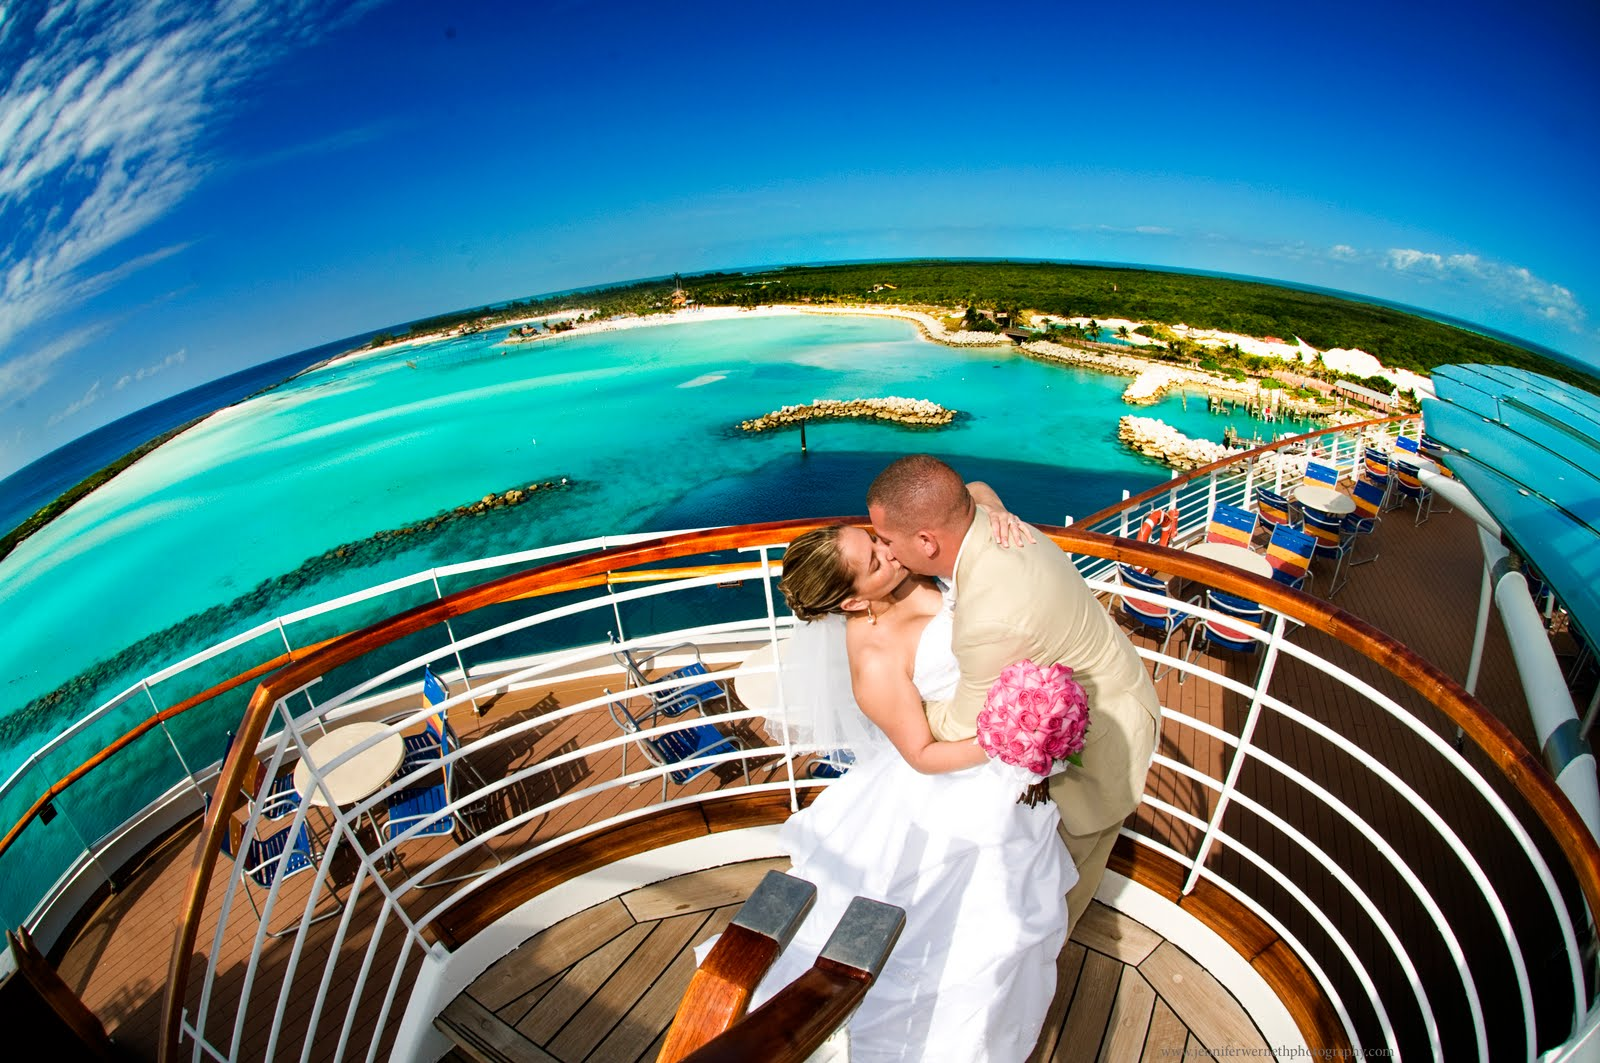 karen daniels wedding disney wonder cruise wedding photography. Resume Example. Resume CV Cover Letter